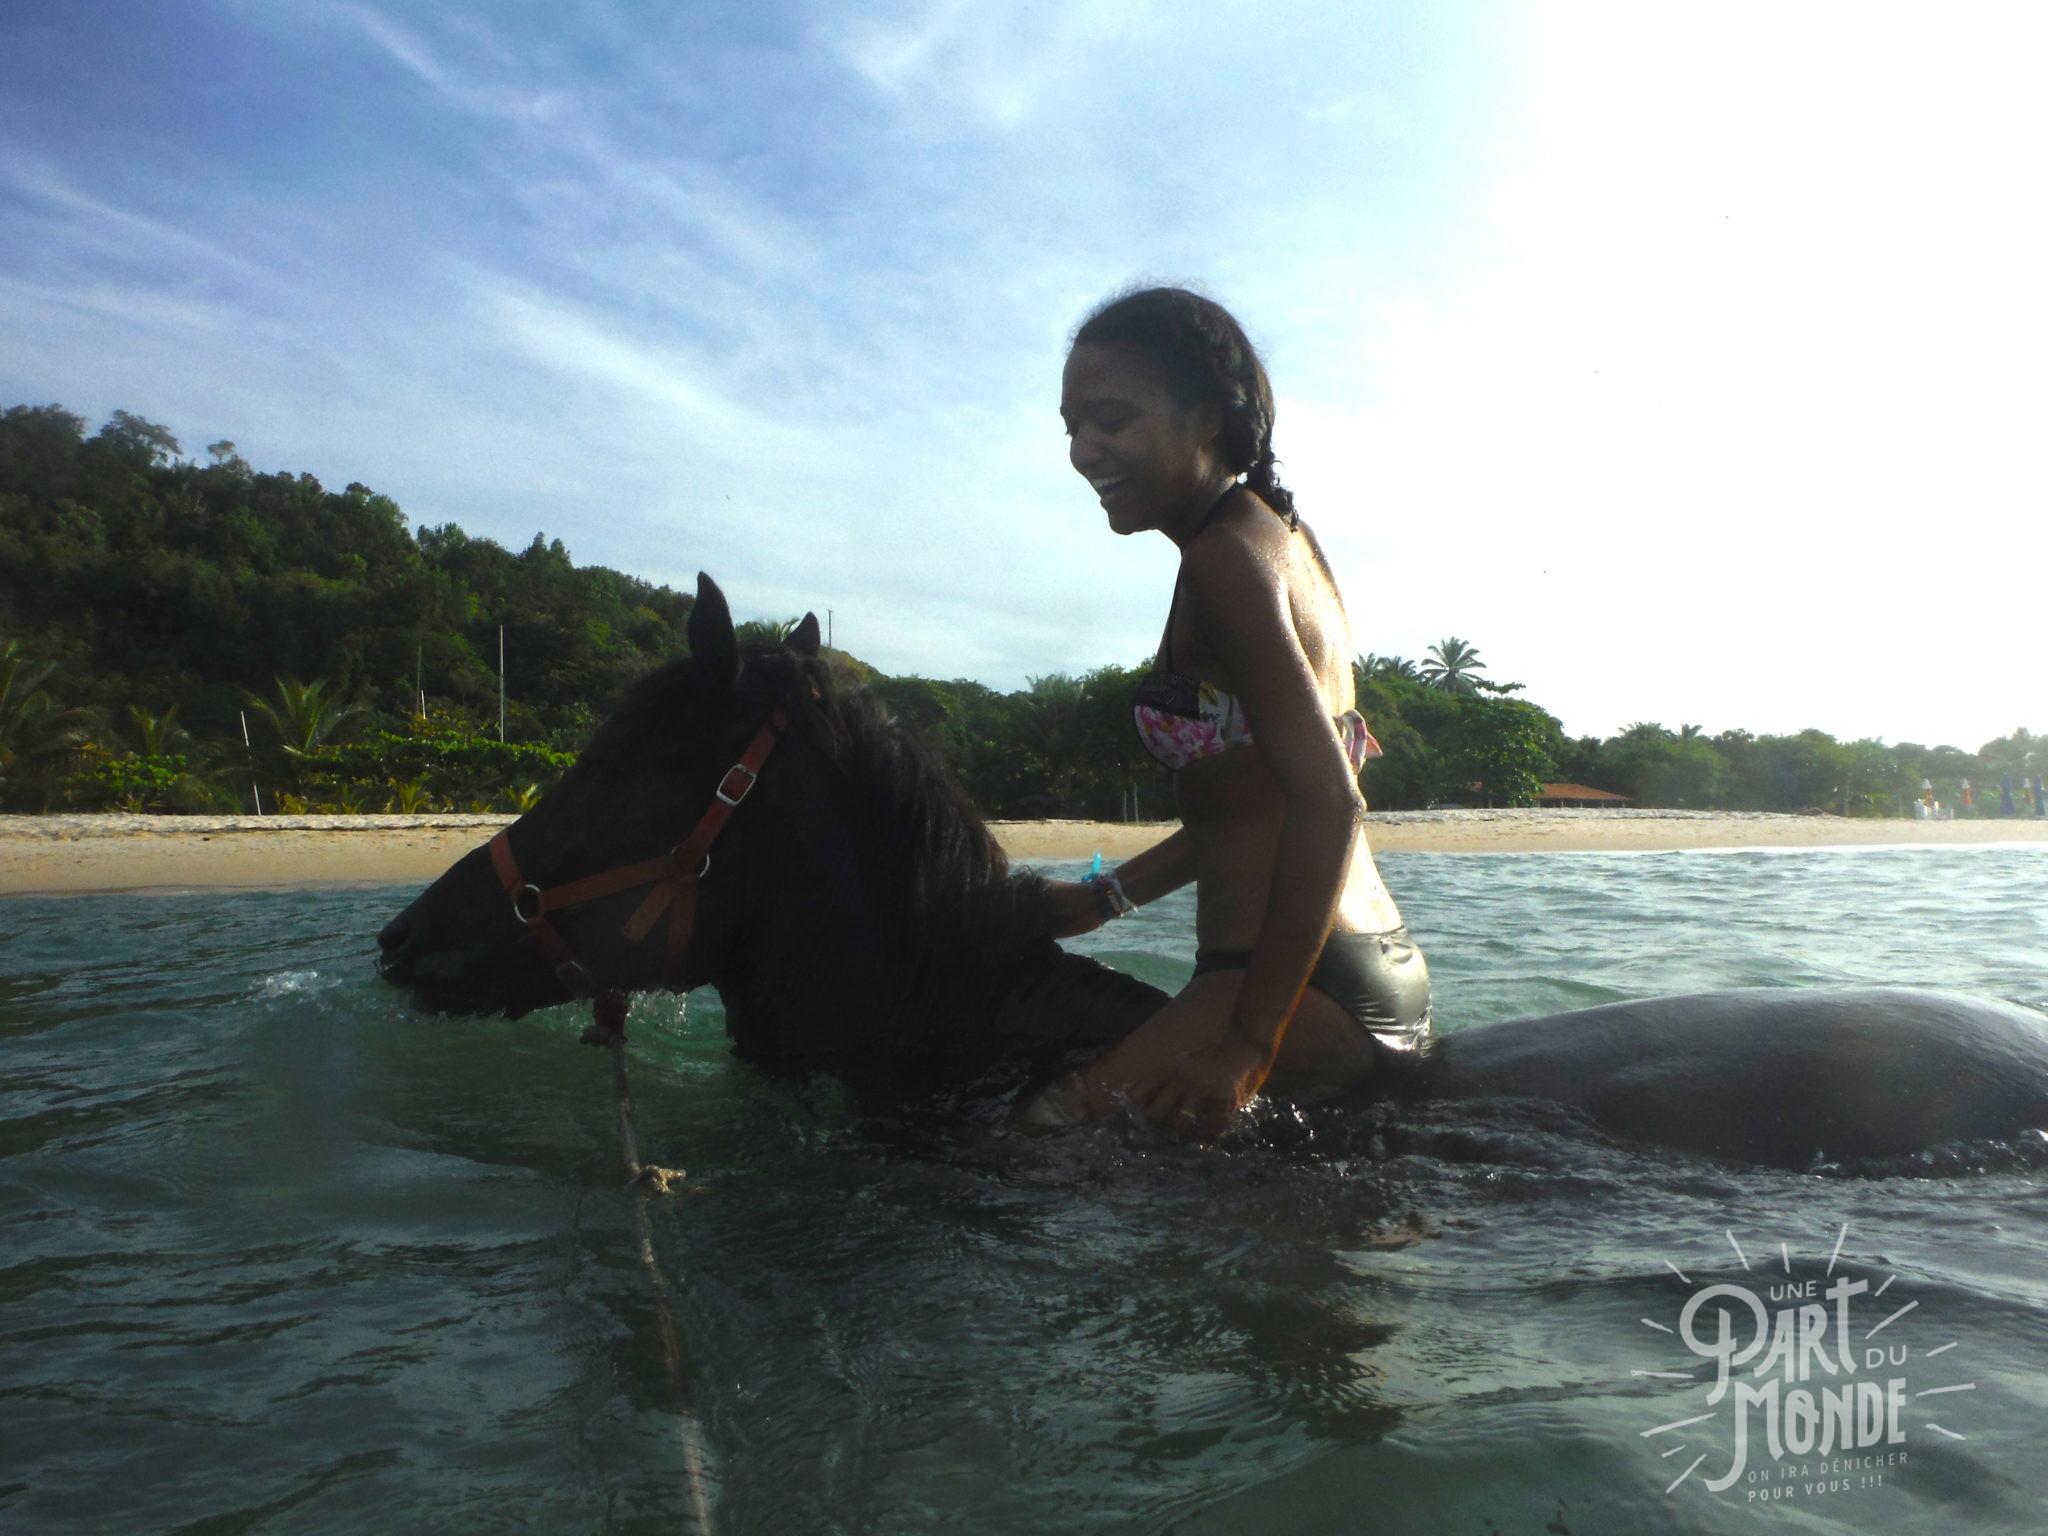 île de tinharé nage cheval 2